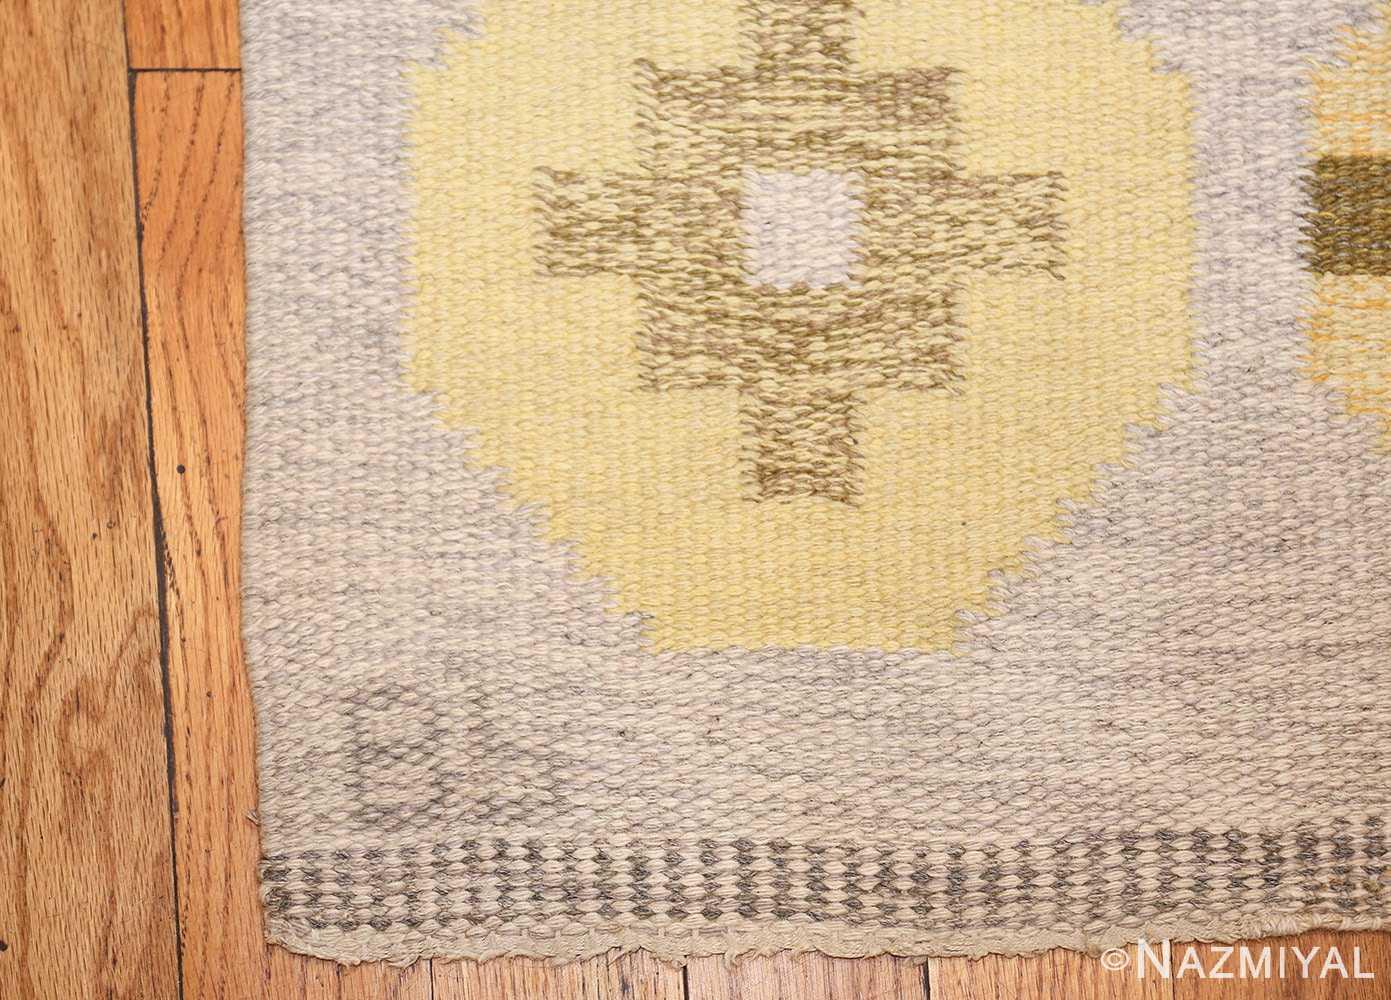 vintage barbro spinchorn swedish kilim rug 48188 initials Nazmiyal